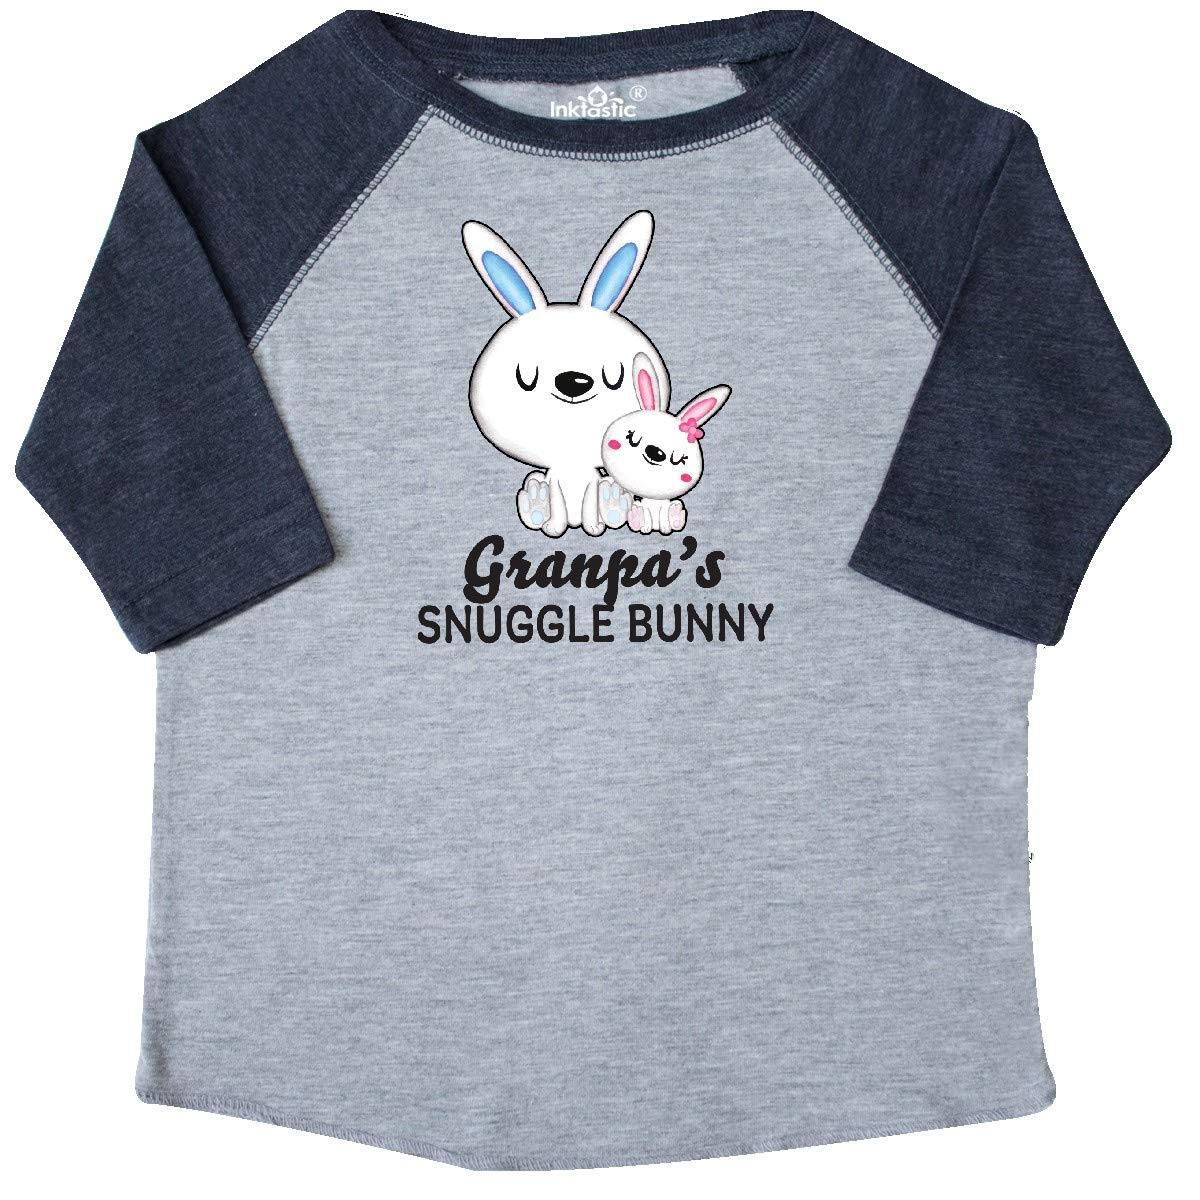 inktastic Granpas Snuggle Bunny Easter Toddler T-Shirt